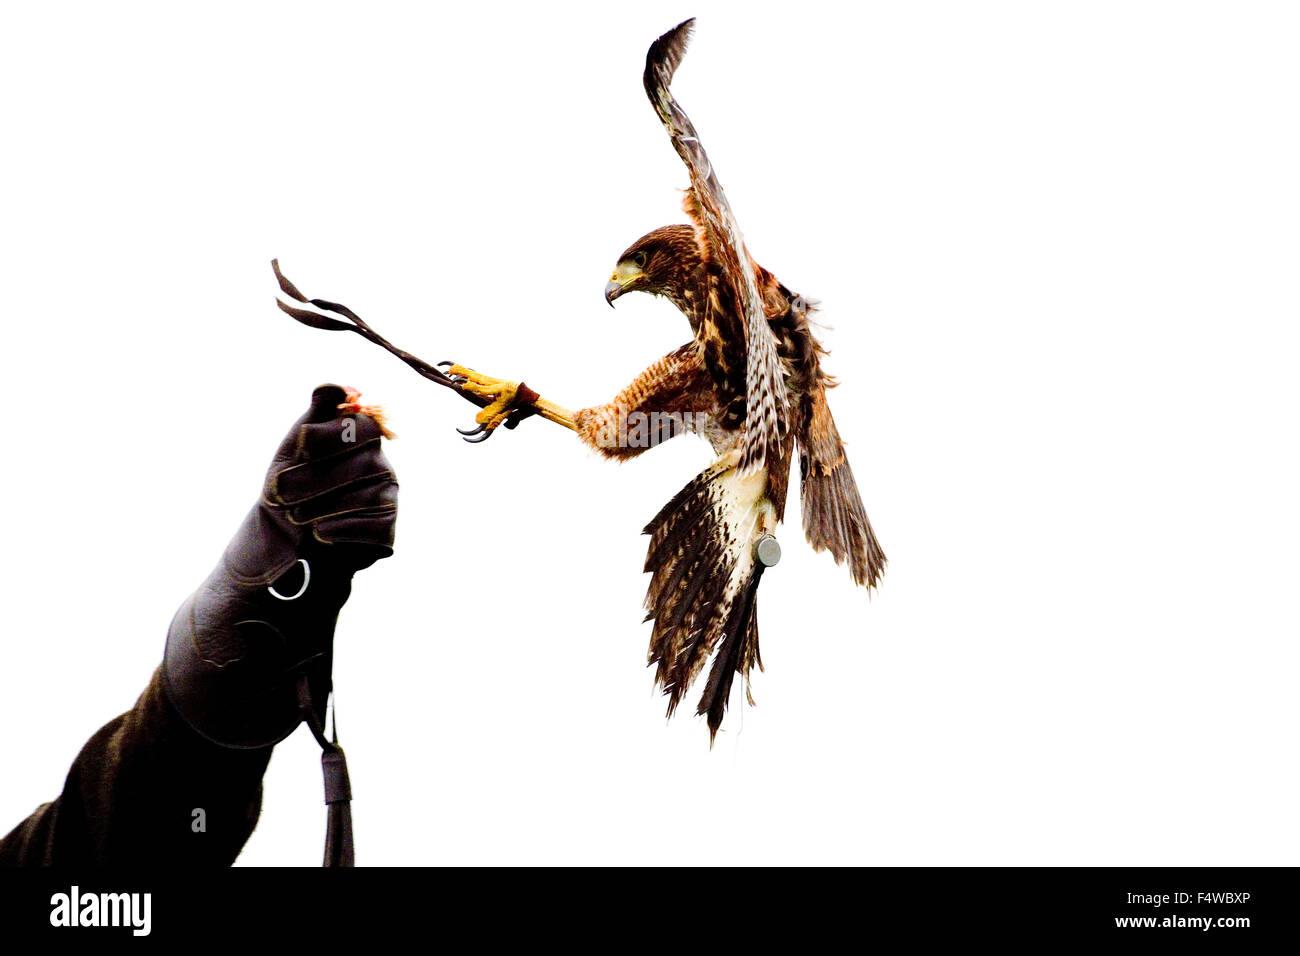 eagle grabbing the bait off a person, harris hawk - Stock Image